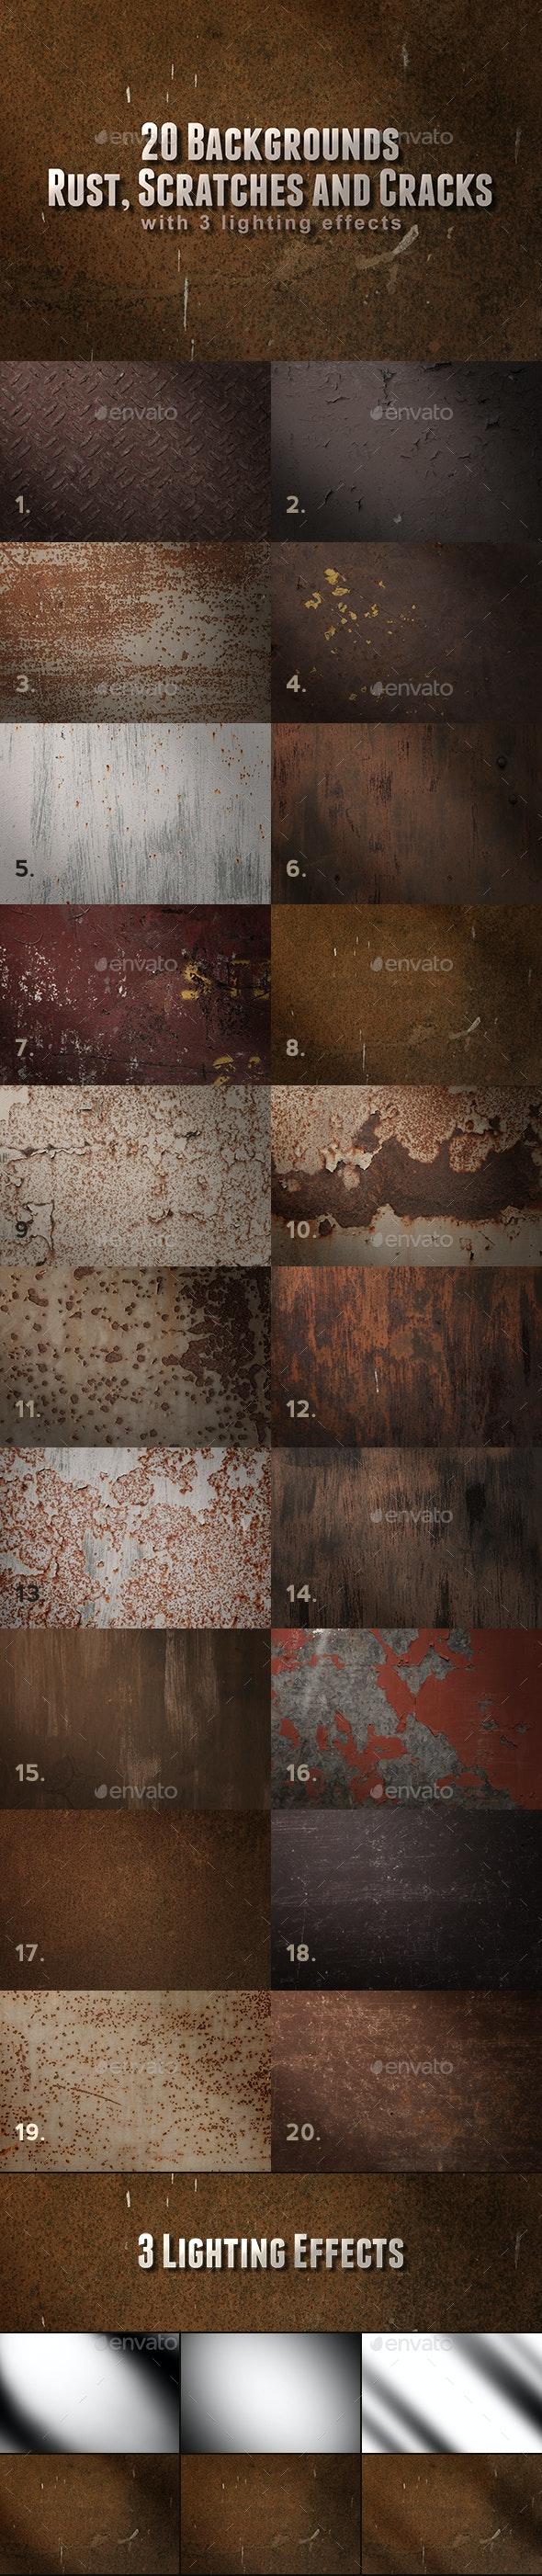 Metal Rust, Scratches and Cracks Backgrounds - Metal Textures